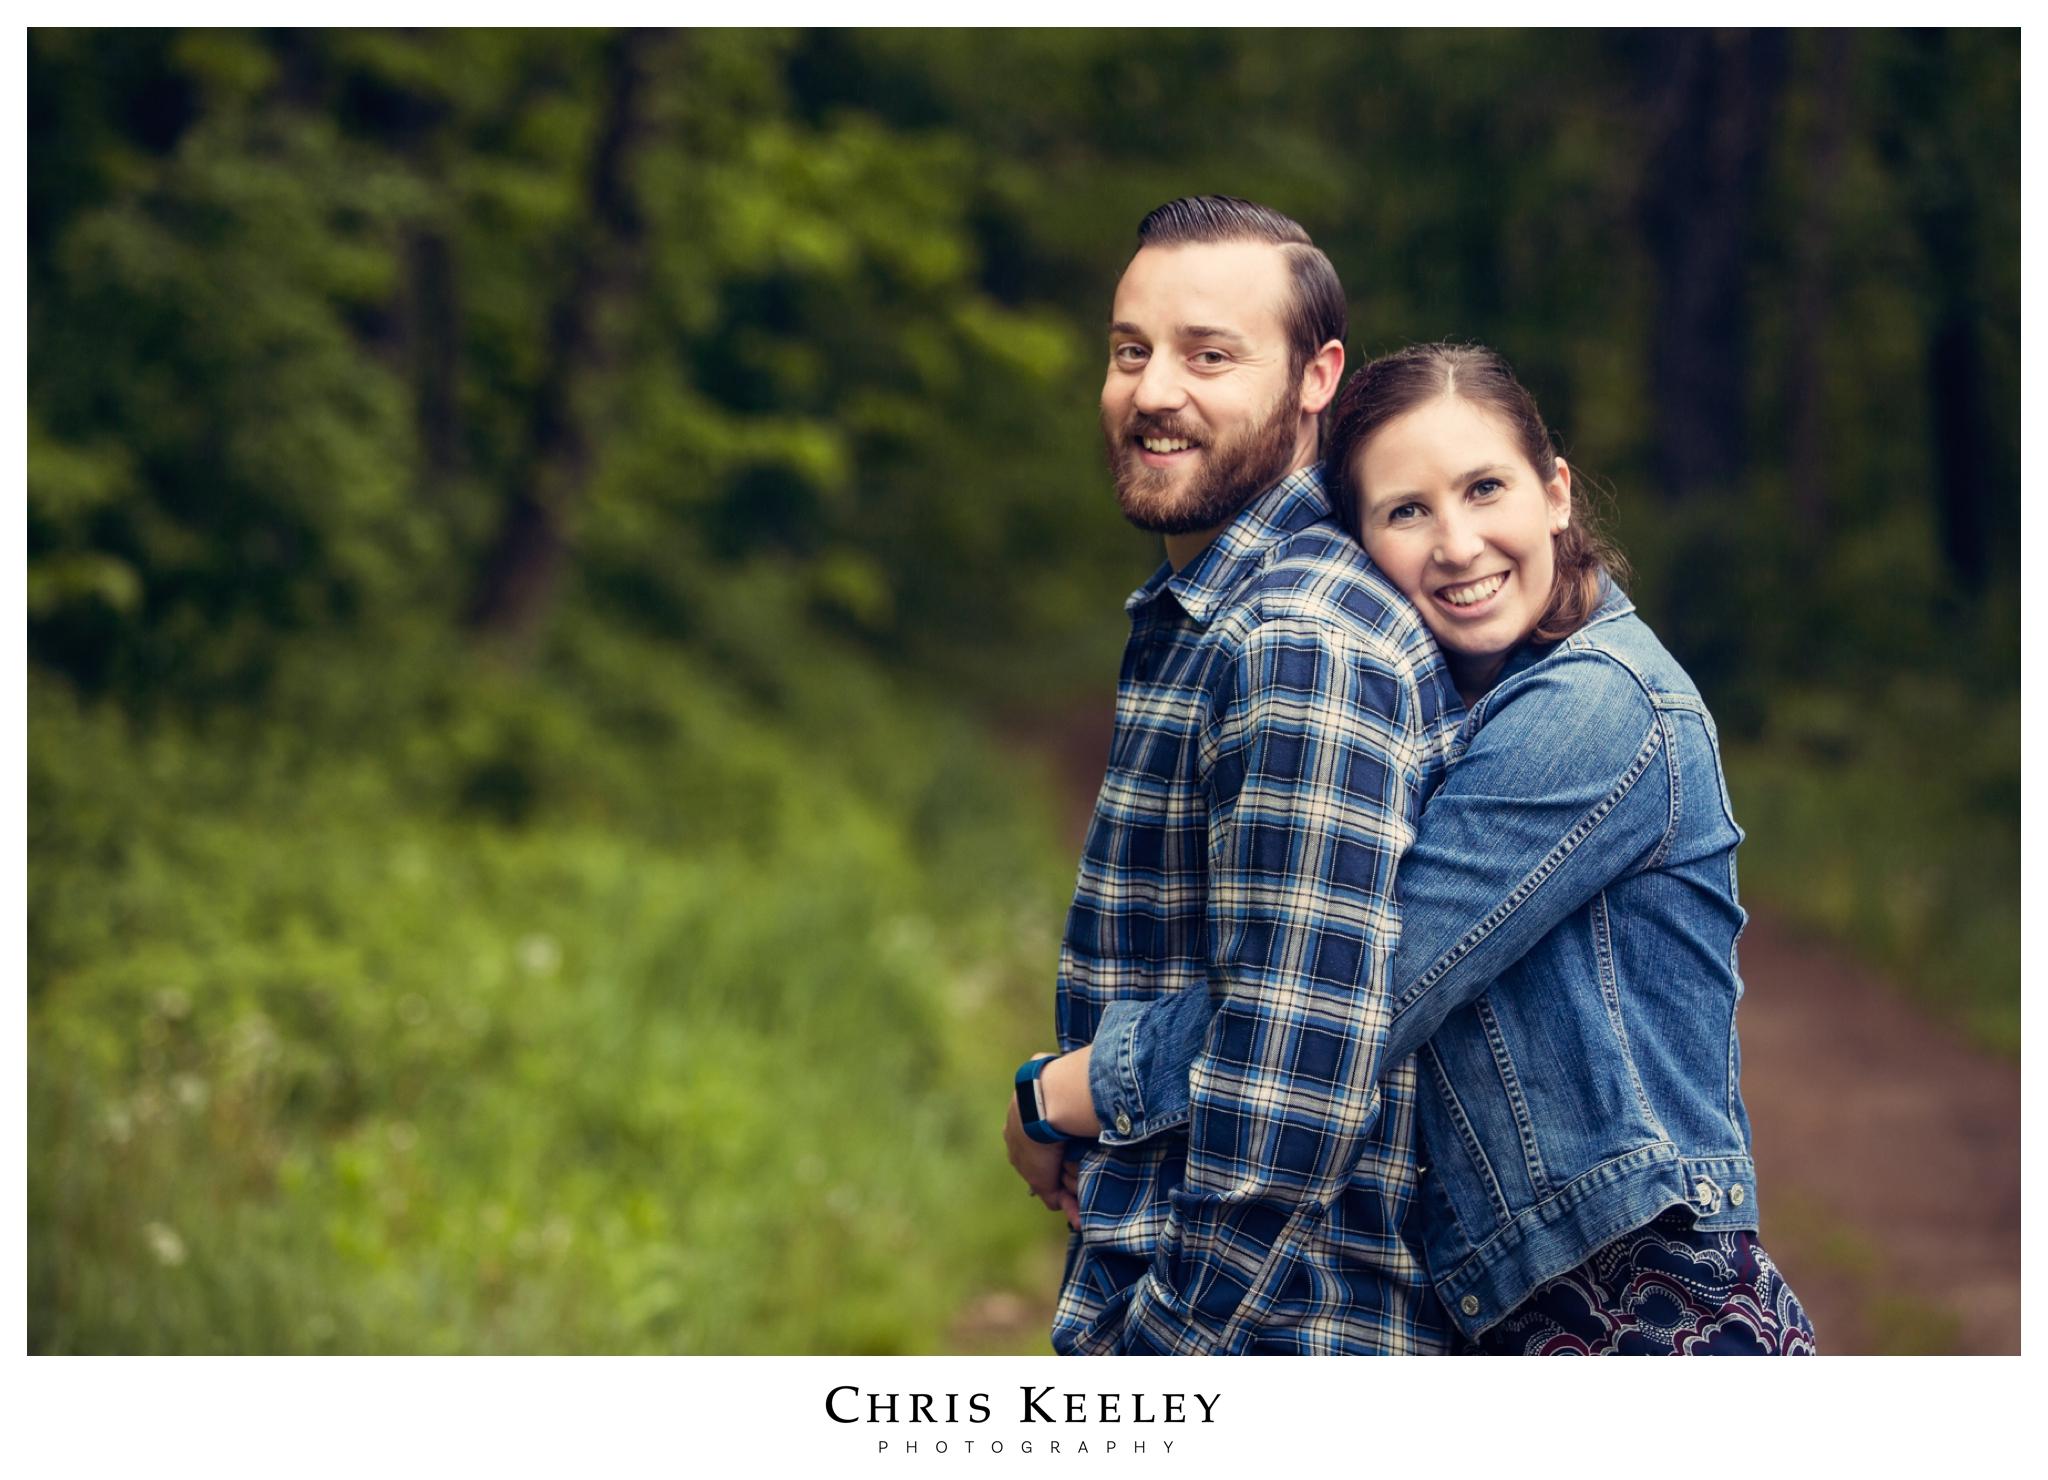 25-Jennings-Everts-Chris-Keeley-Photography.jpg